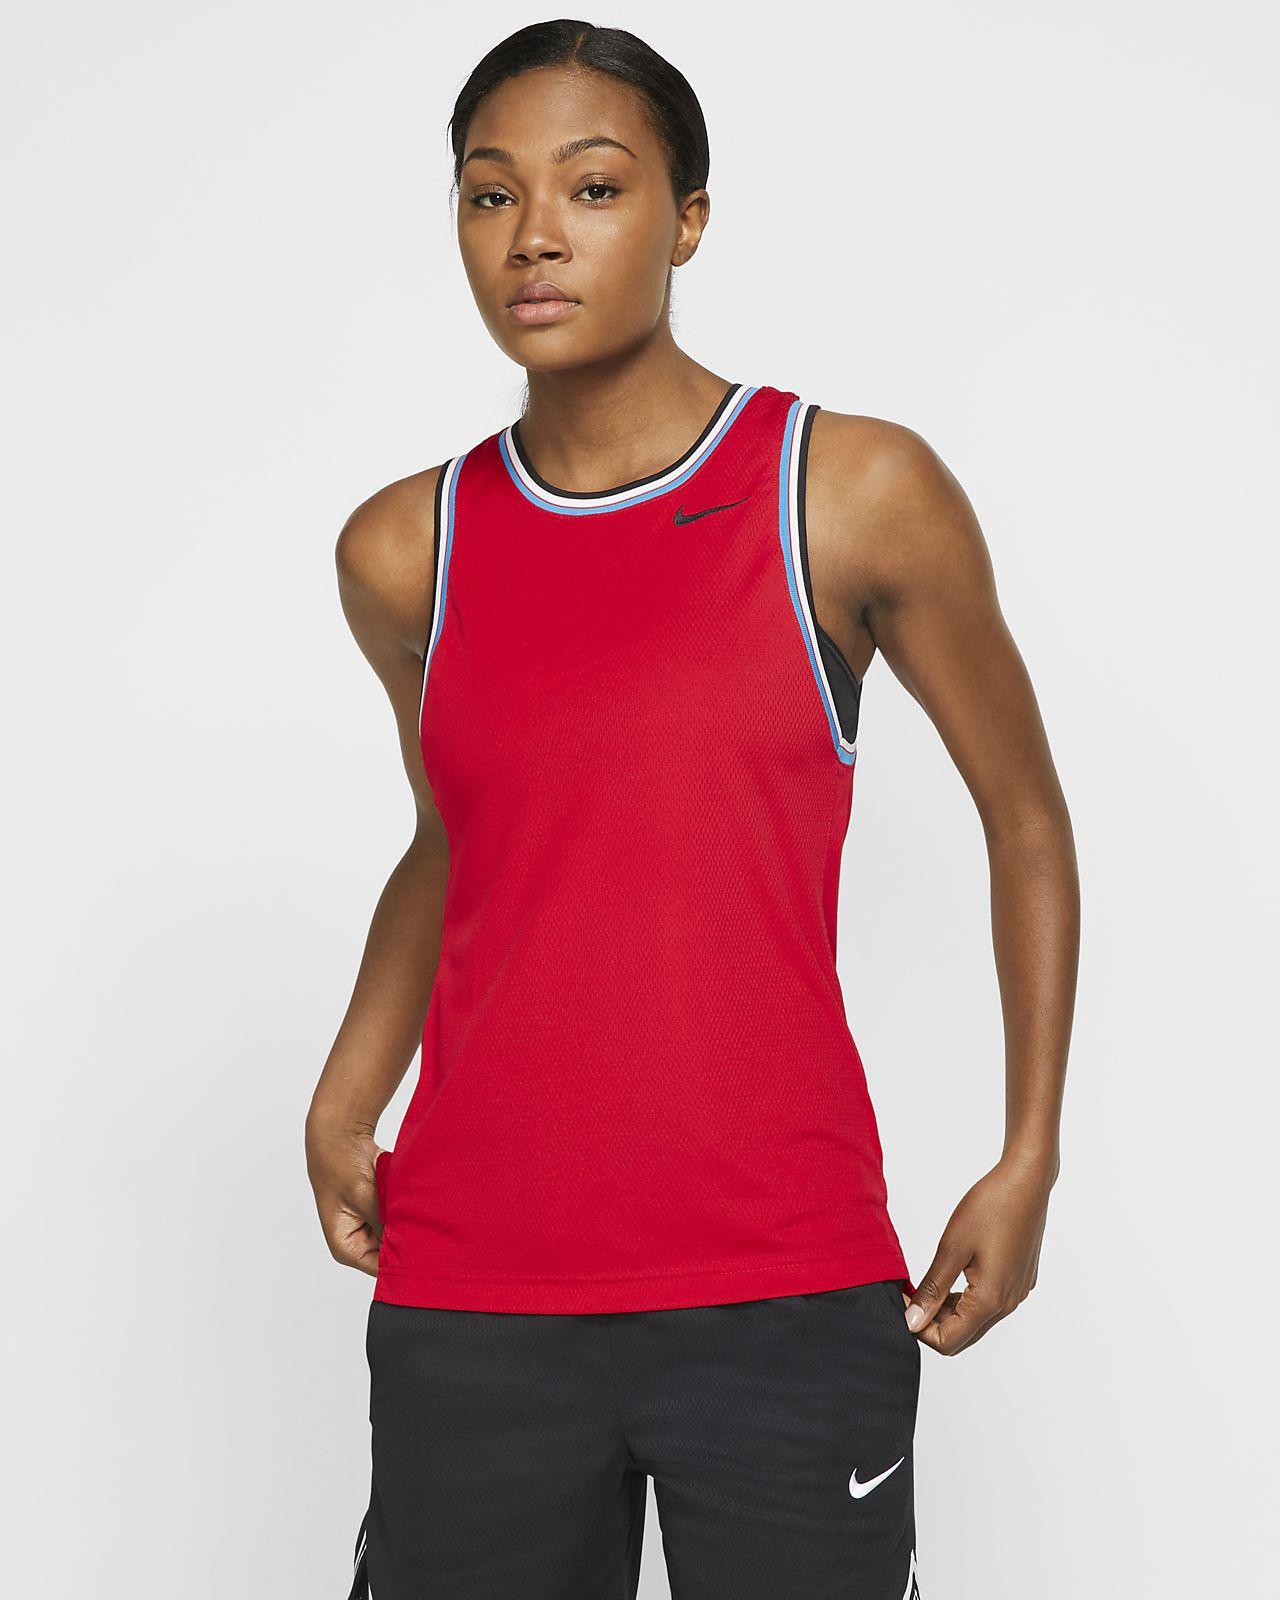 Camisola de basquetebol sem mangas Nike Dri-FIT para mulher